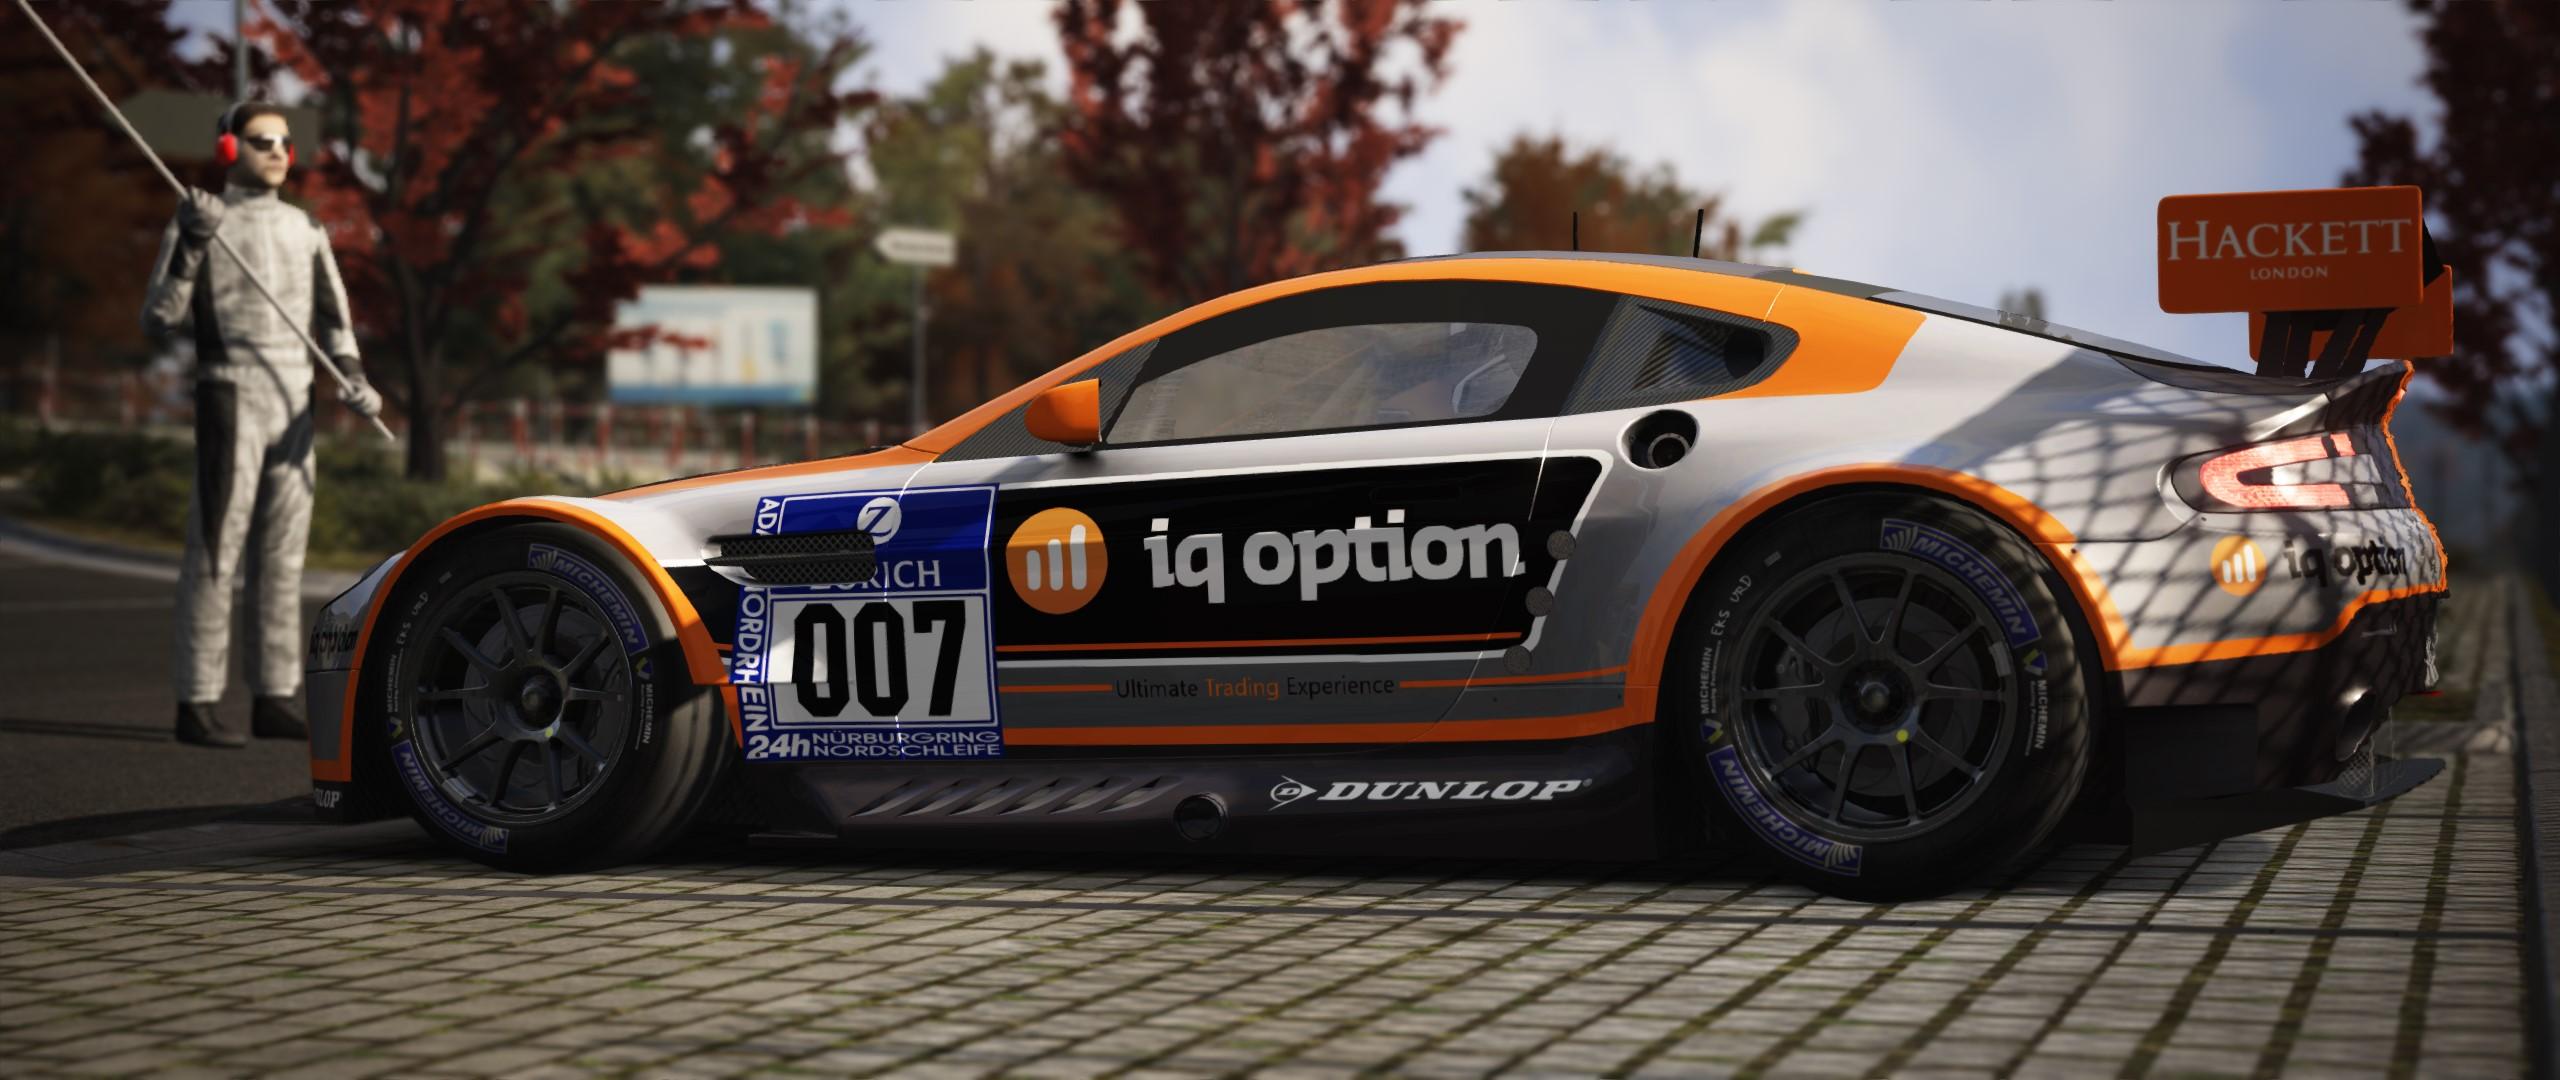 URD EGT AM IQ Option Aston Martin K RaceDepartment - Aston martin 117